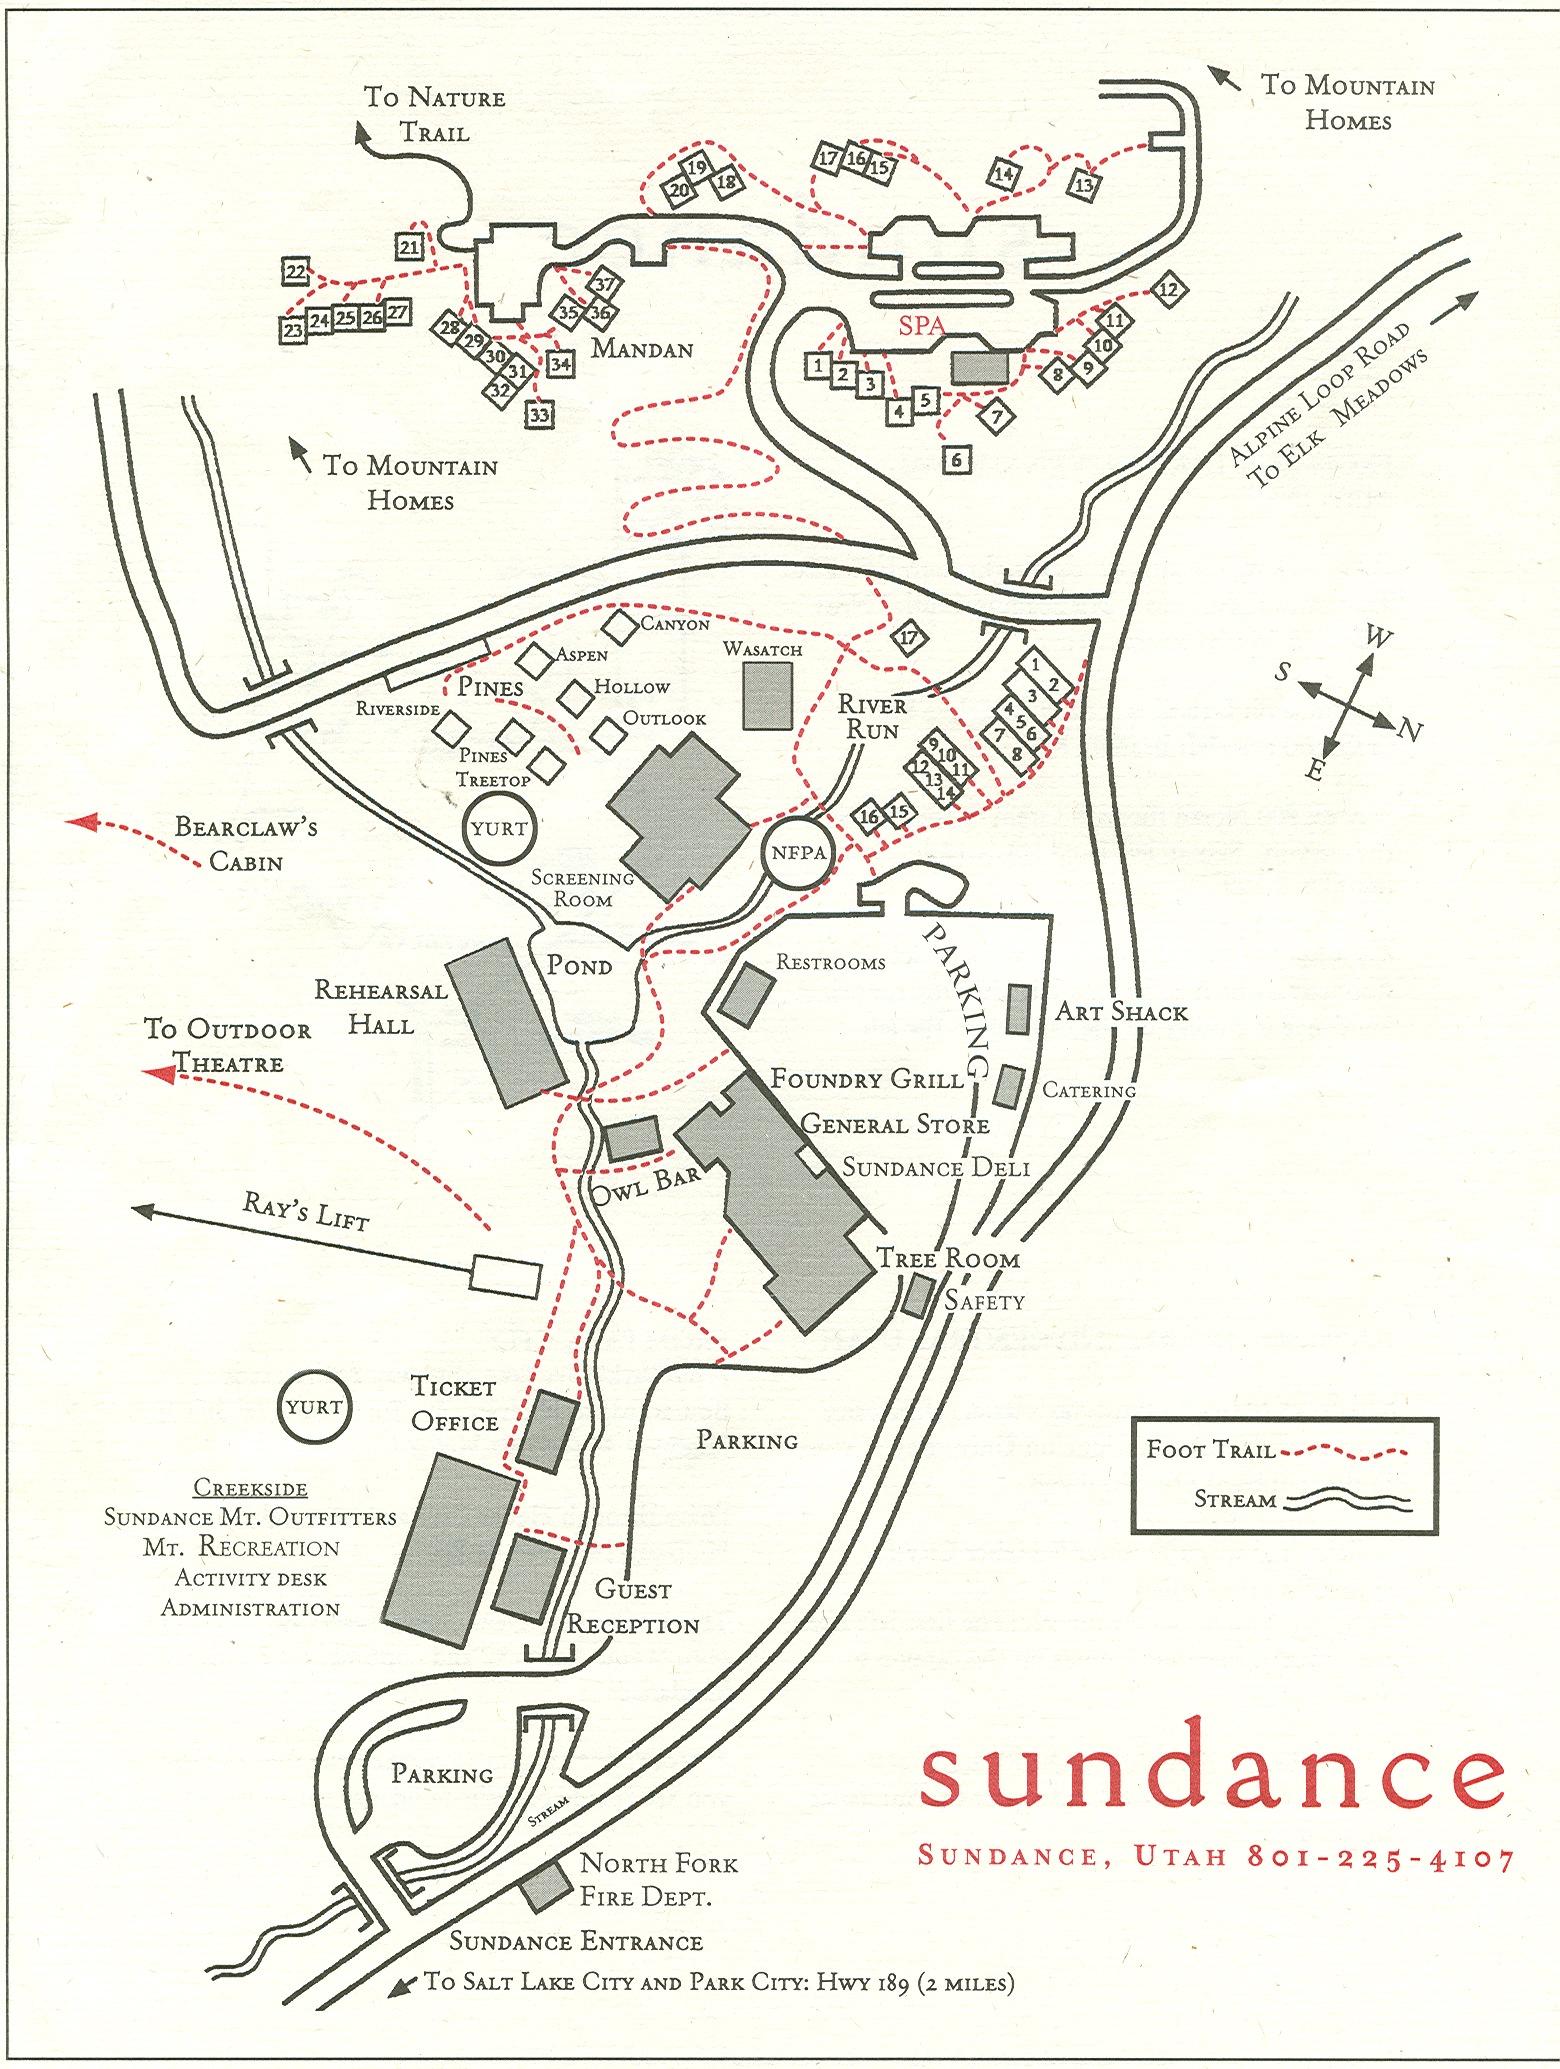 The Sundance Utah Area